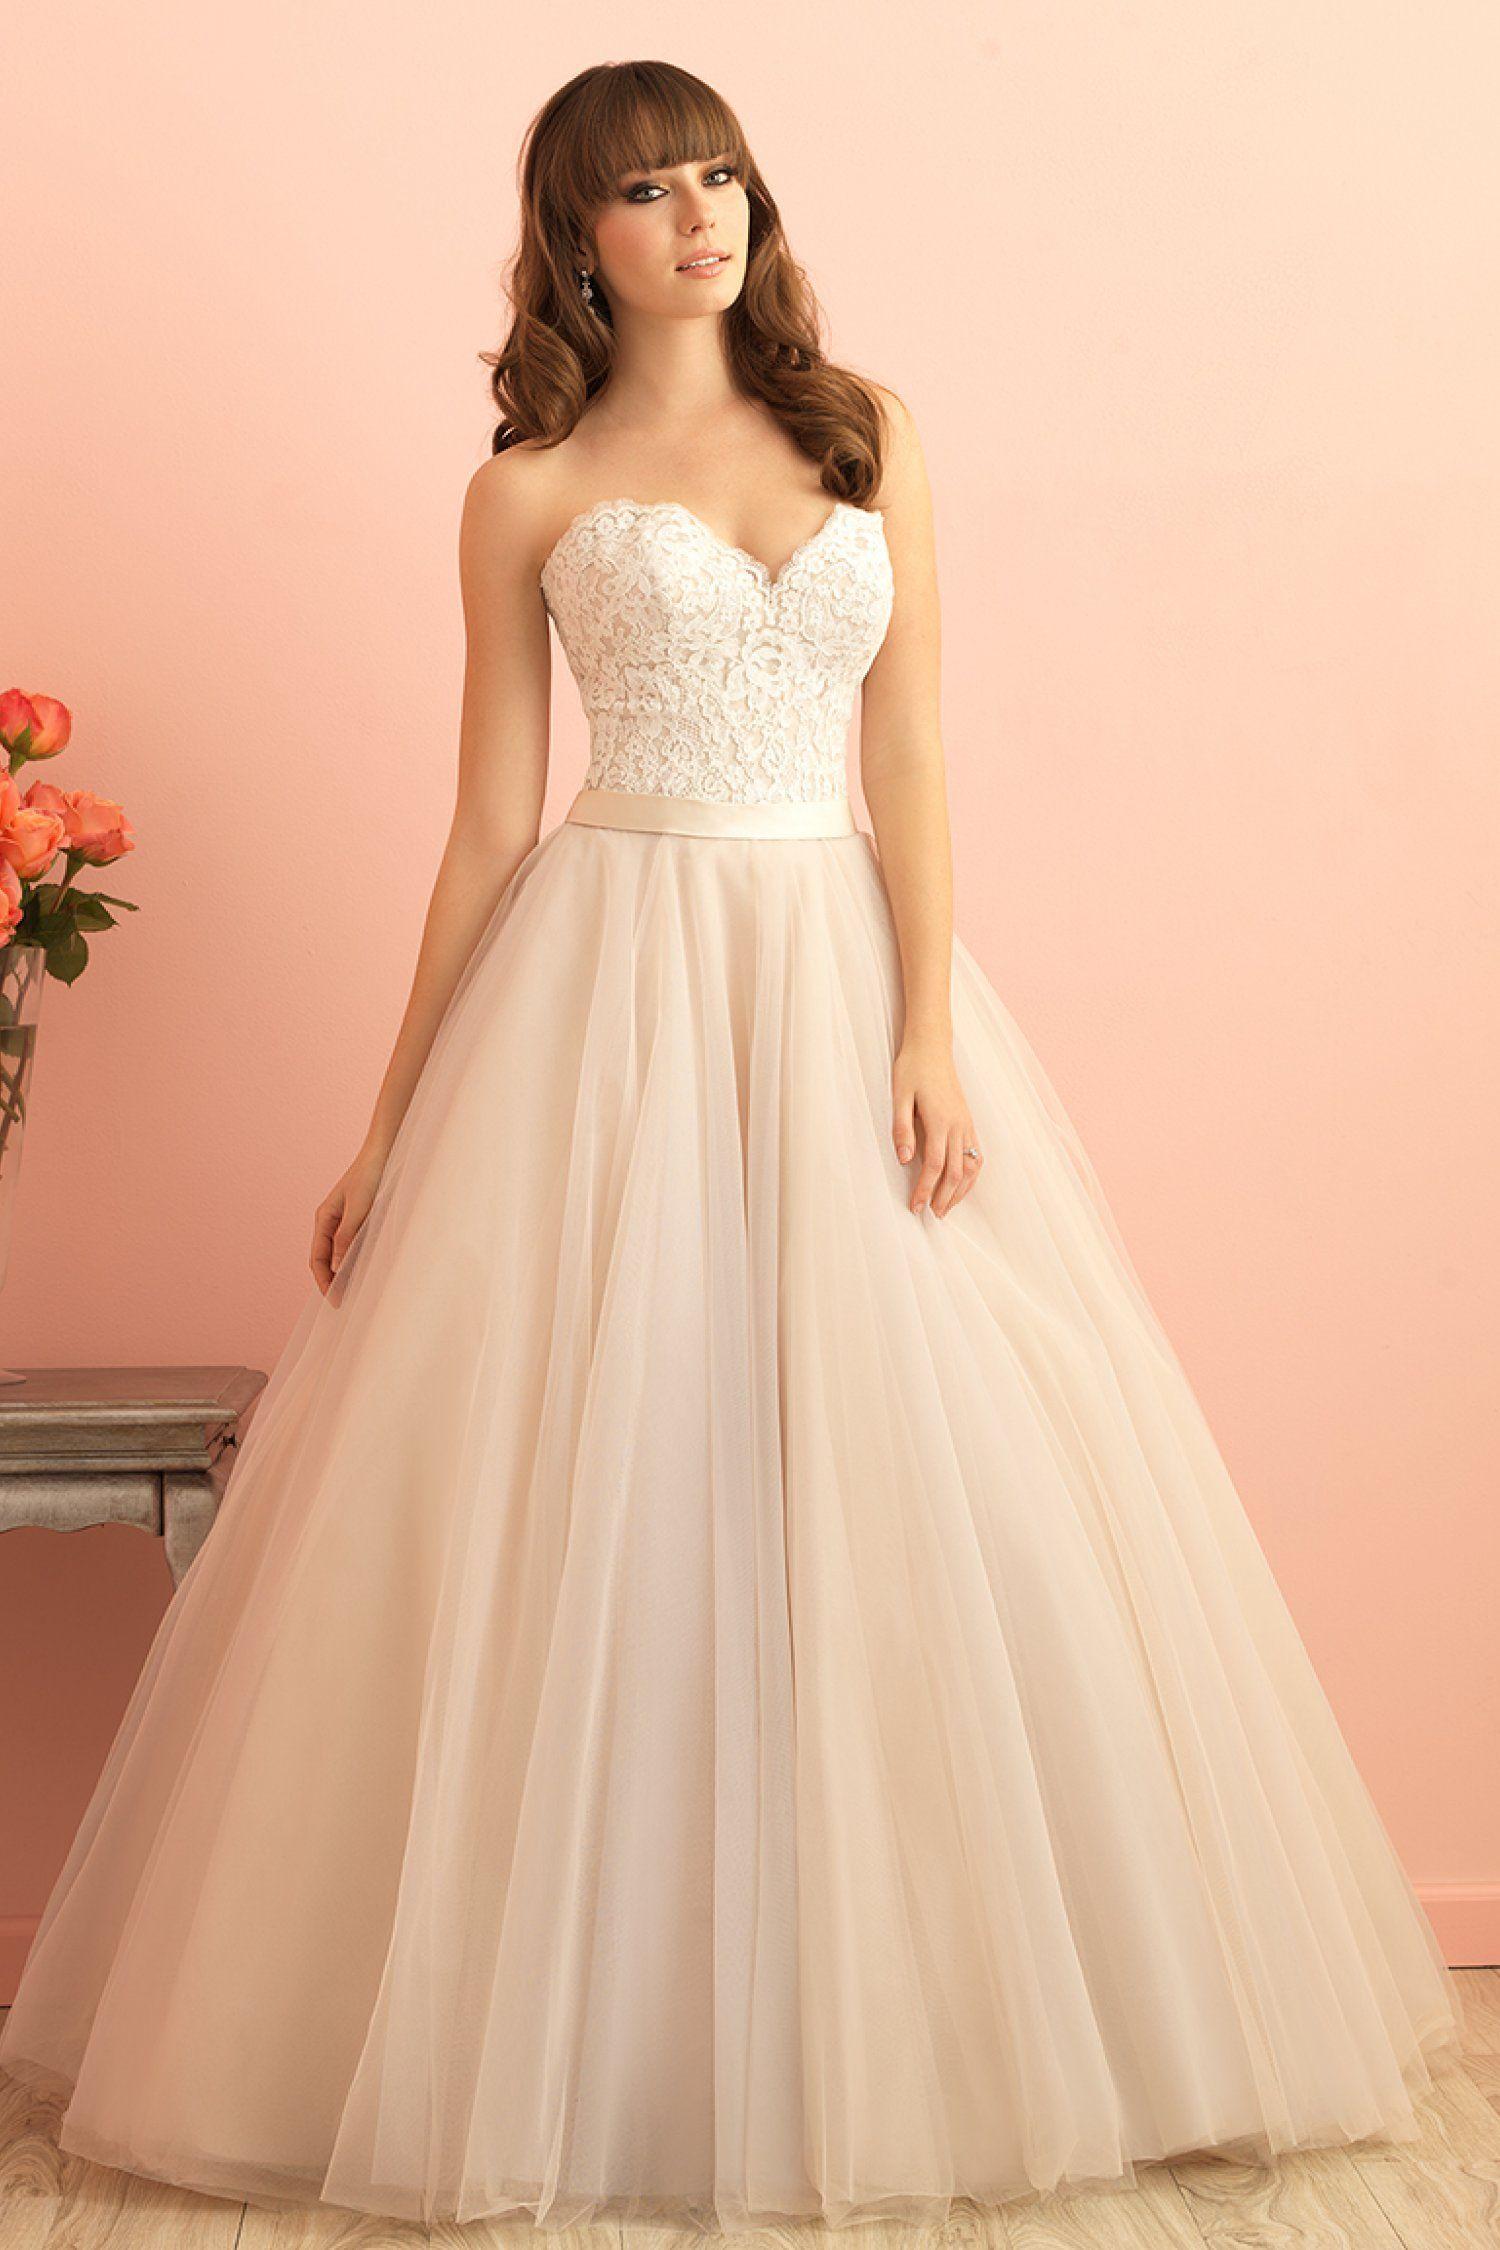 Allure 2853 - Debra\'s Bridal Shop at The Avenues 9365 Philips ...